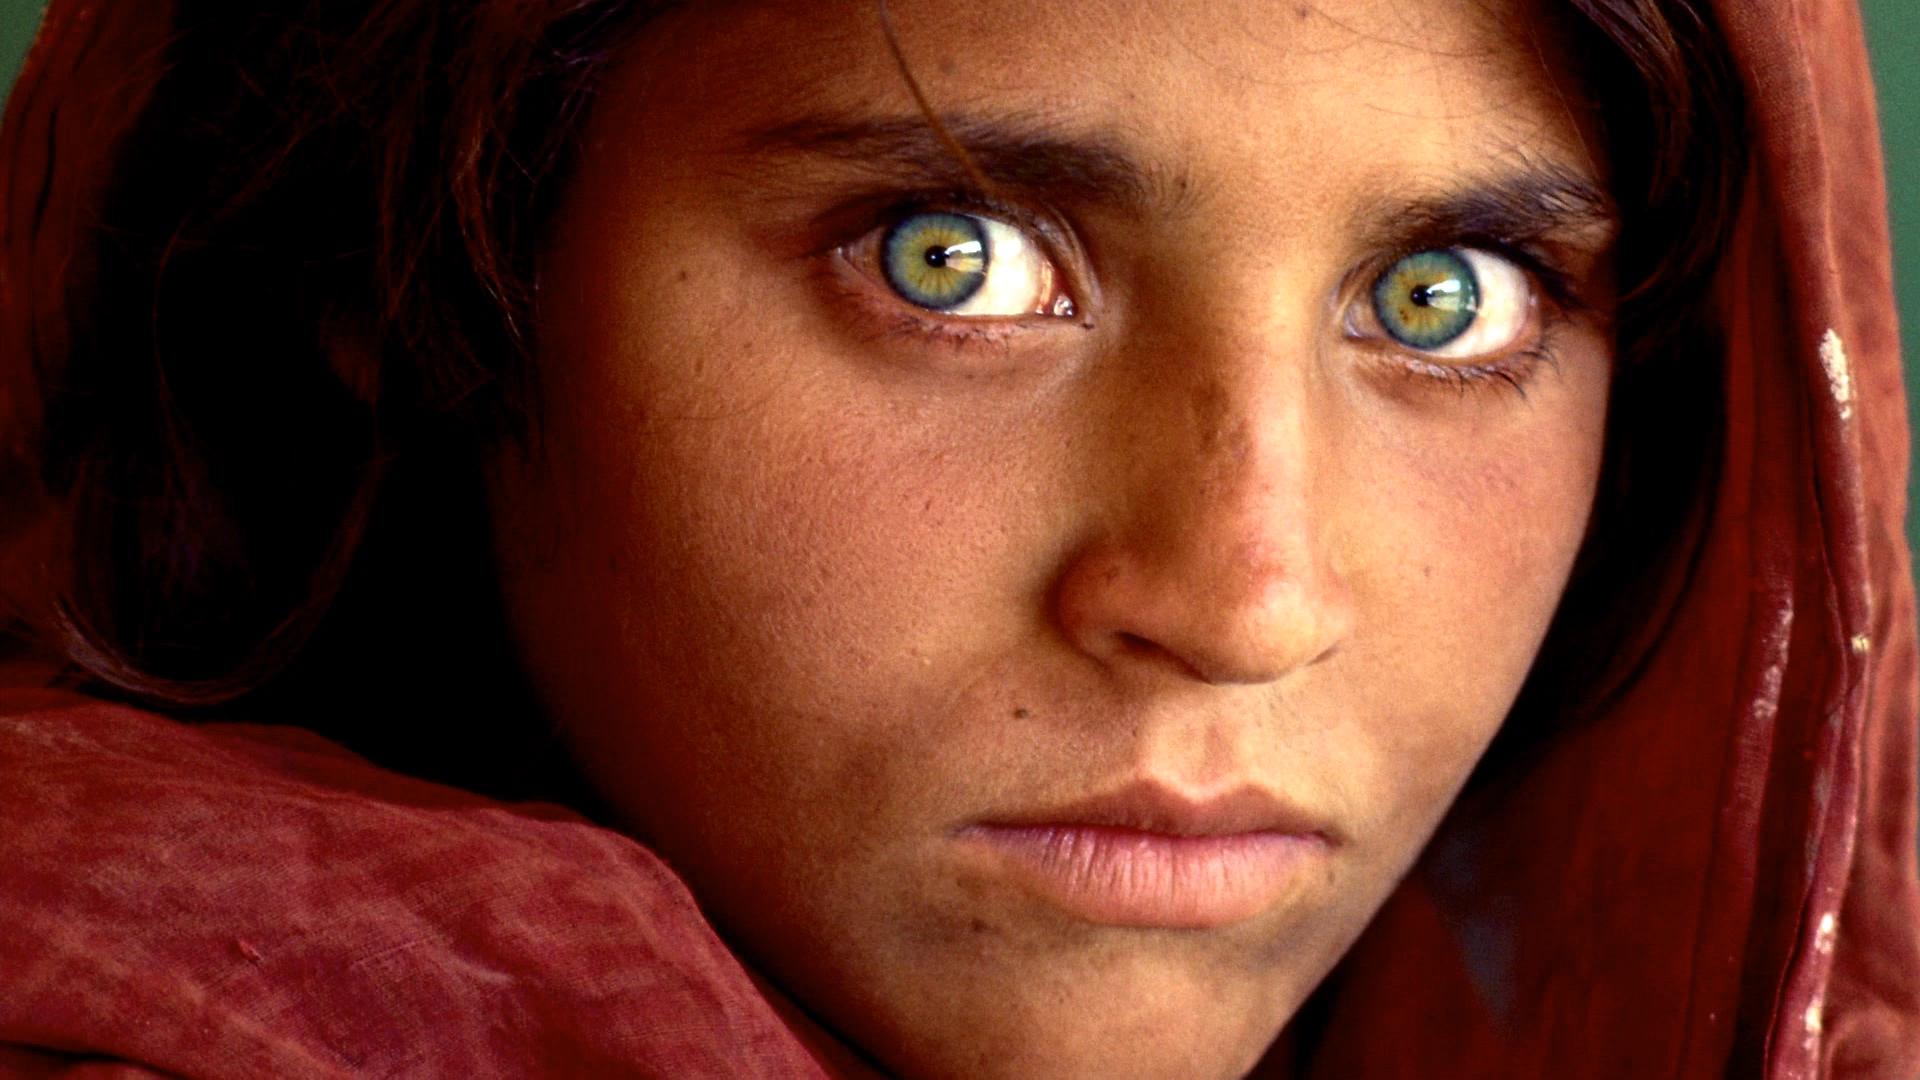 pakistan will  released afghan girl soon